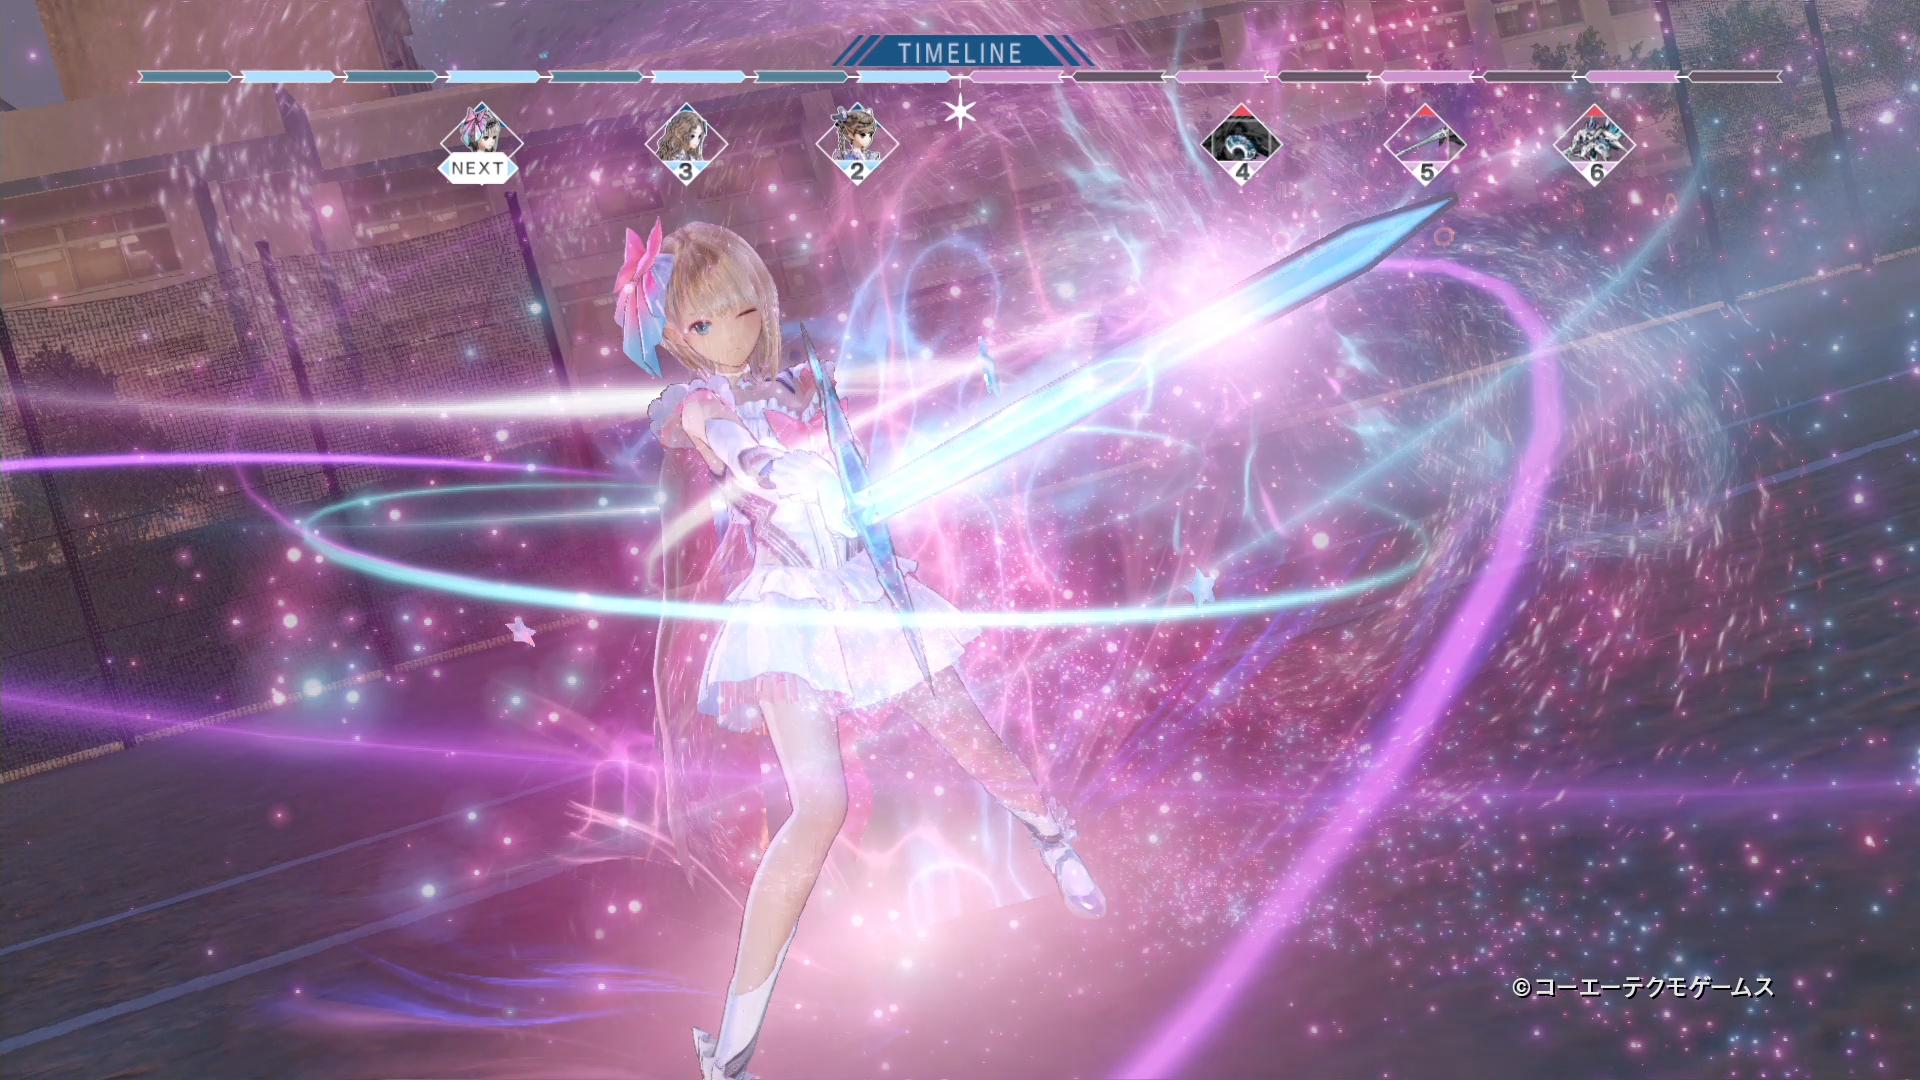 Blue Reflection 幻に舞う少女の剣 プレイムービー第2弾を公開 Game Watch